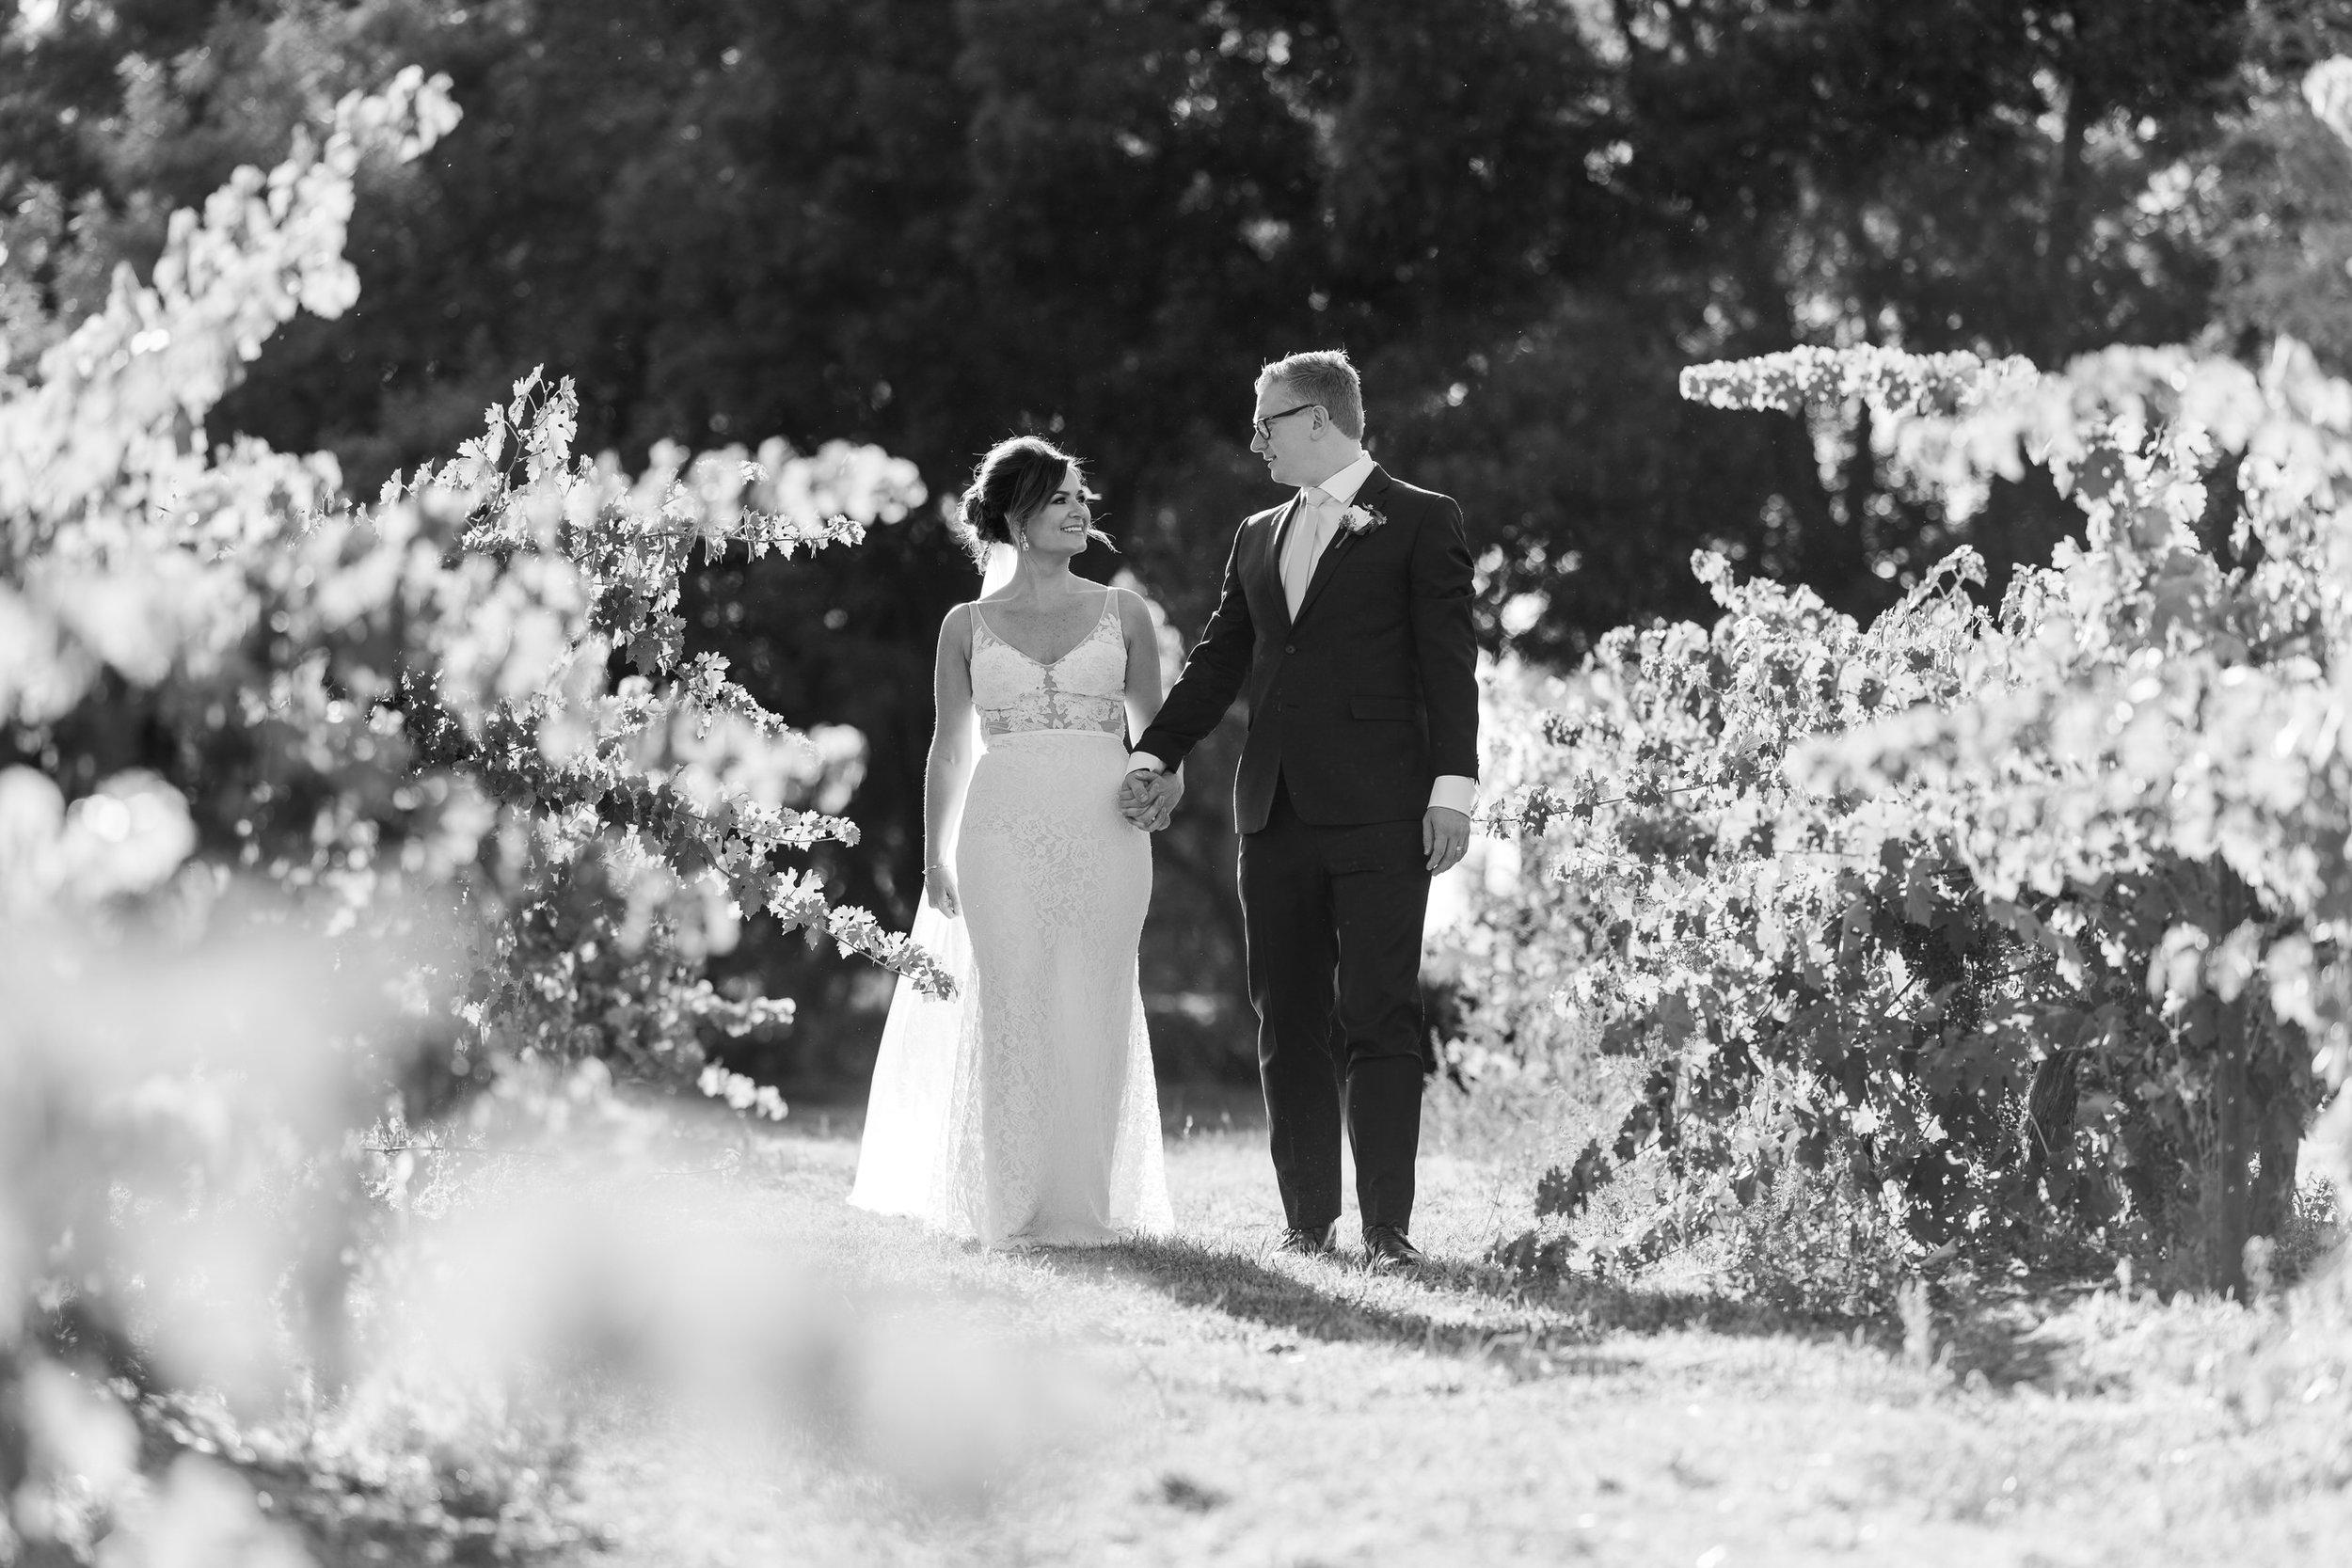 Justin_And_Jim_Photography_Chateau_Dore_Bendigo_Wedding64.JPG